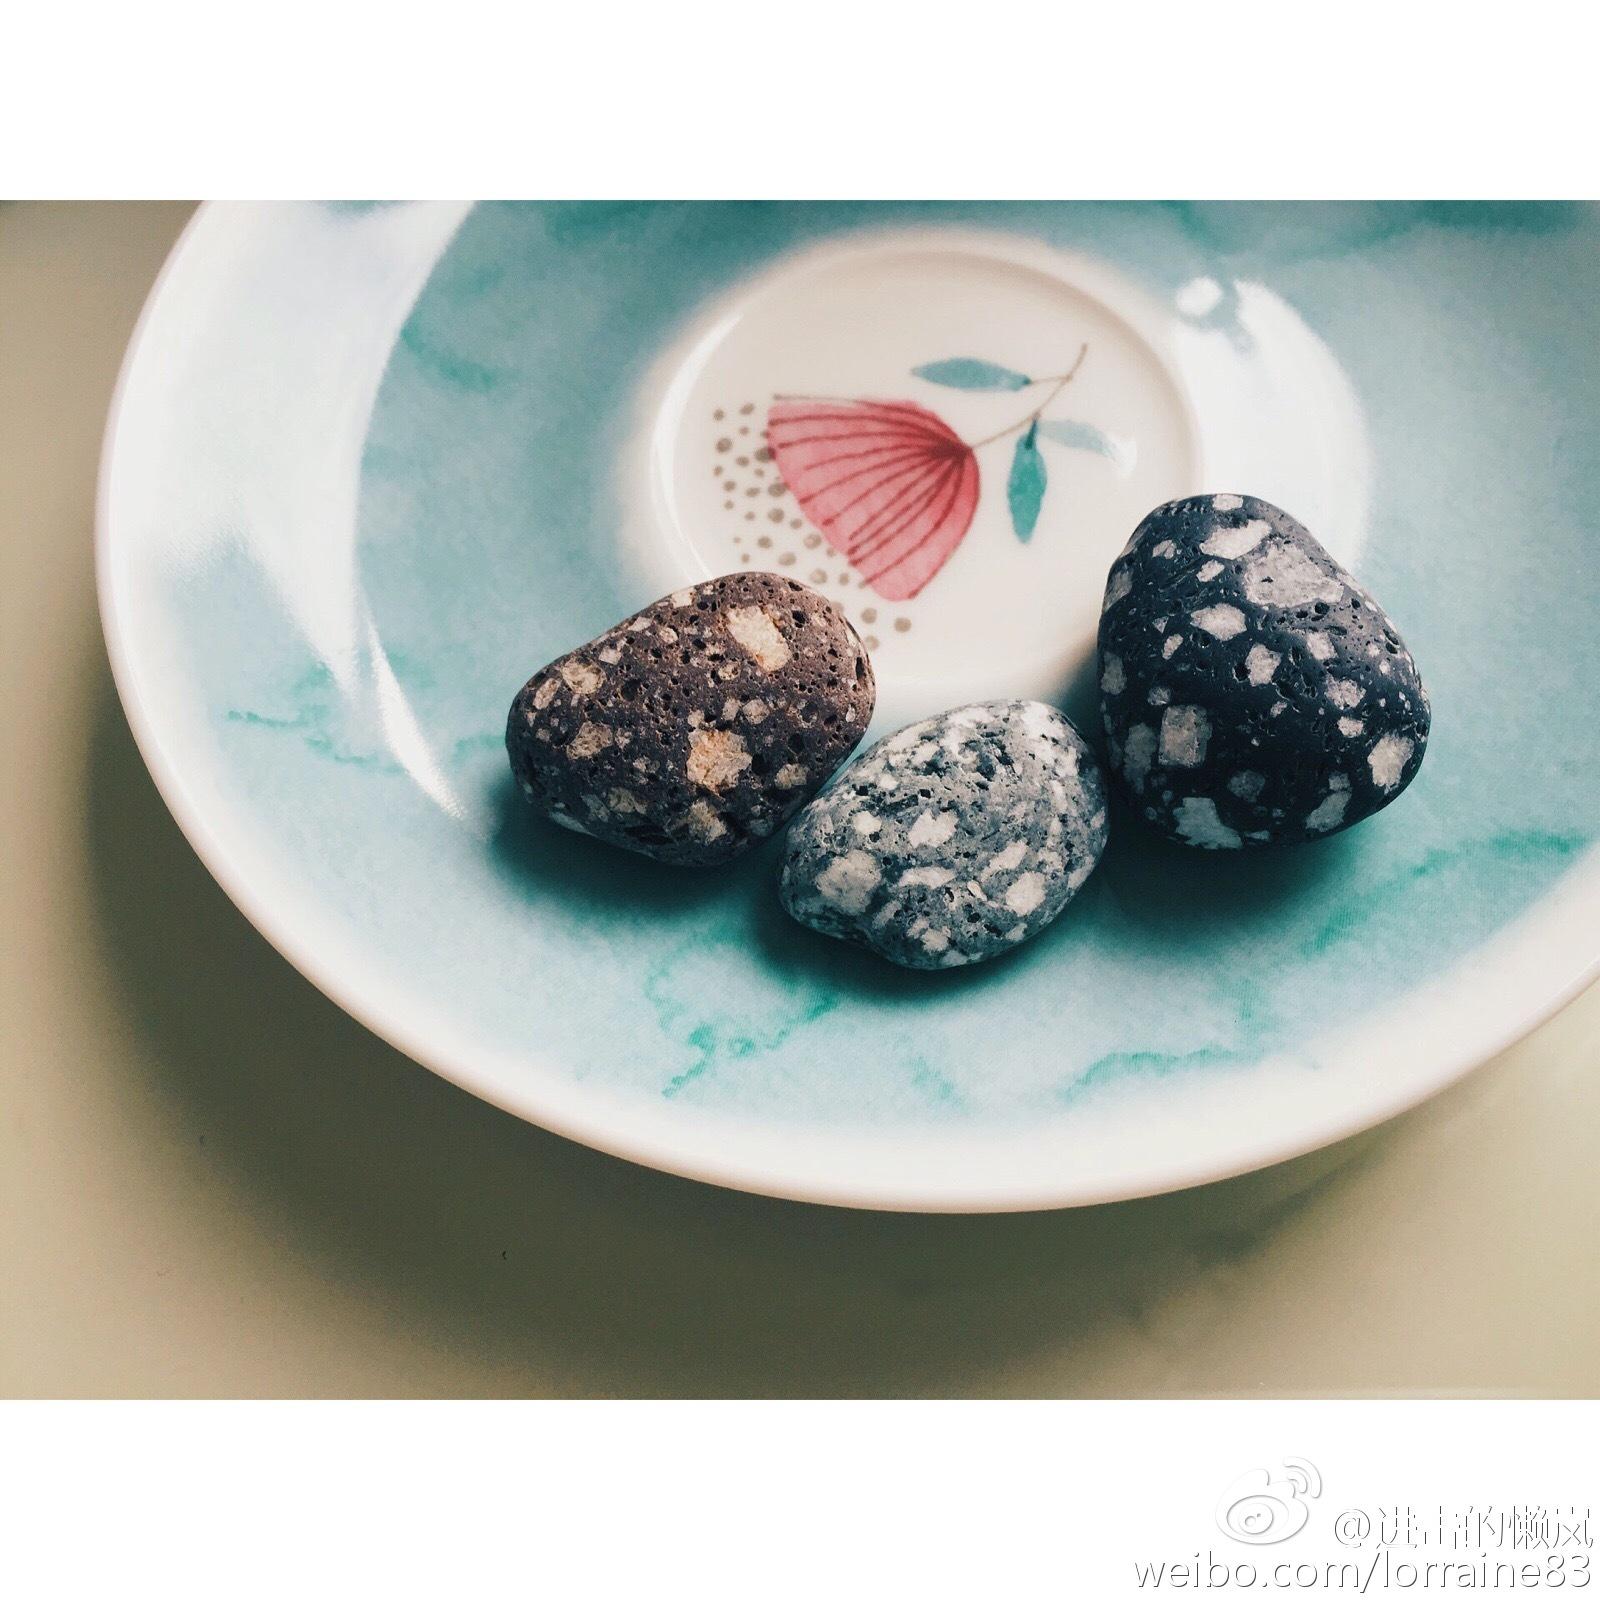 Rocks from Sanxiantai taken by a mainland Chinese tourist. (Sina Weibo)